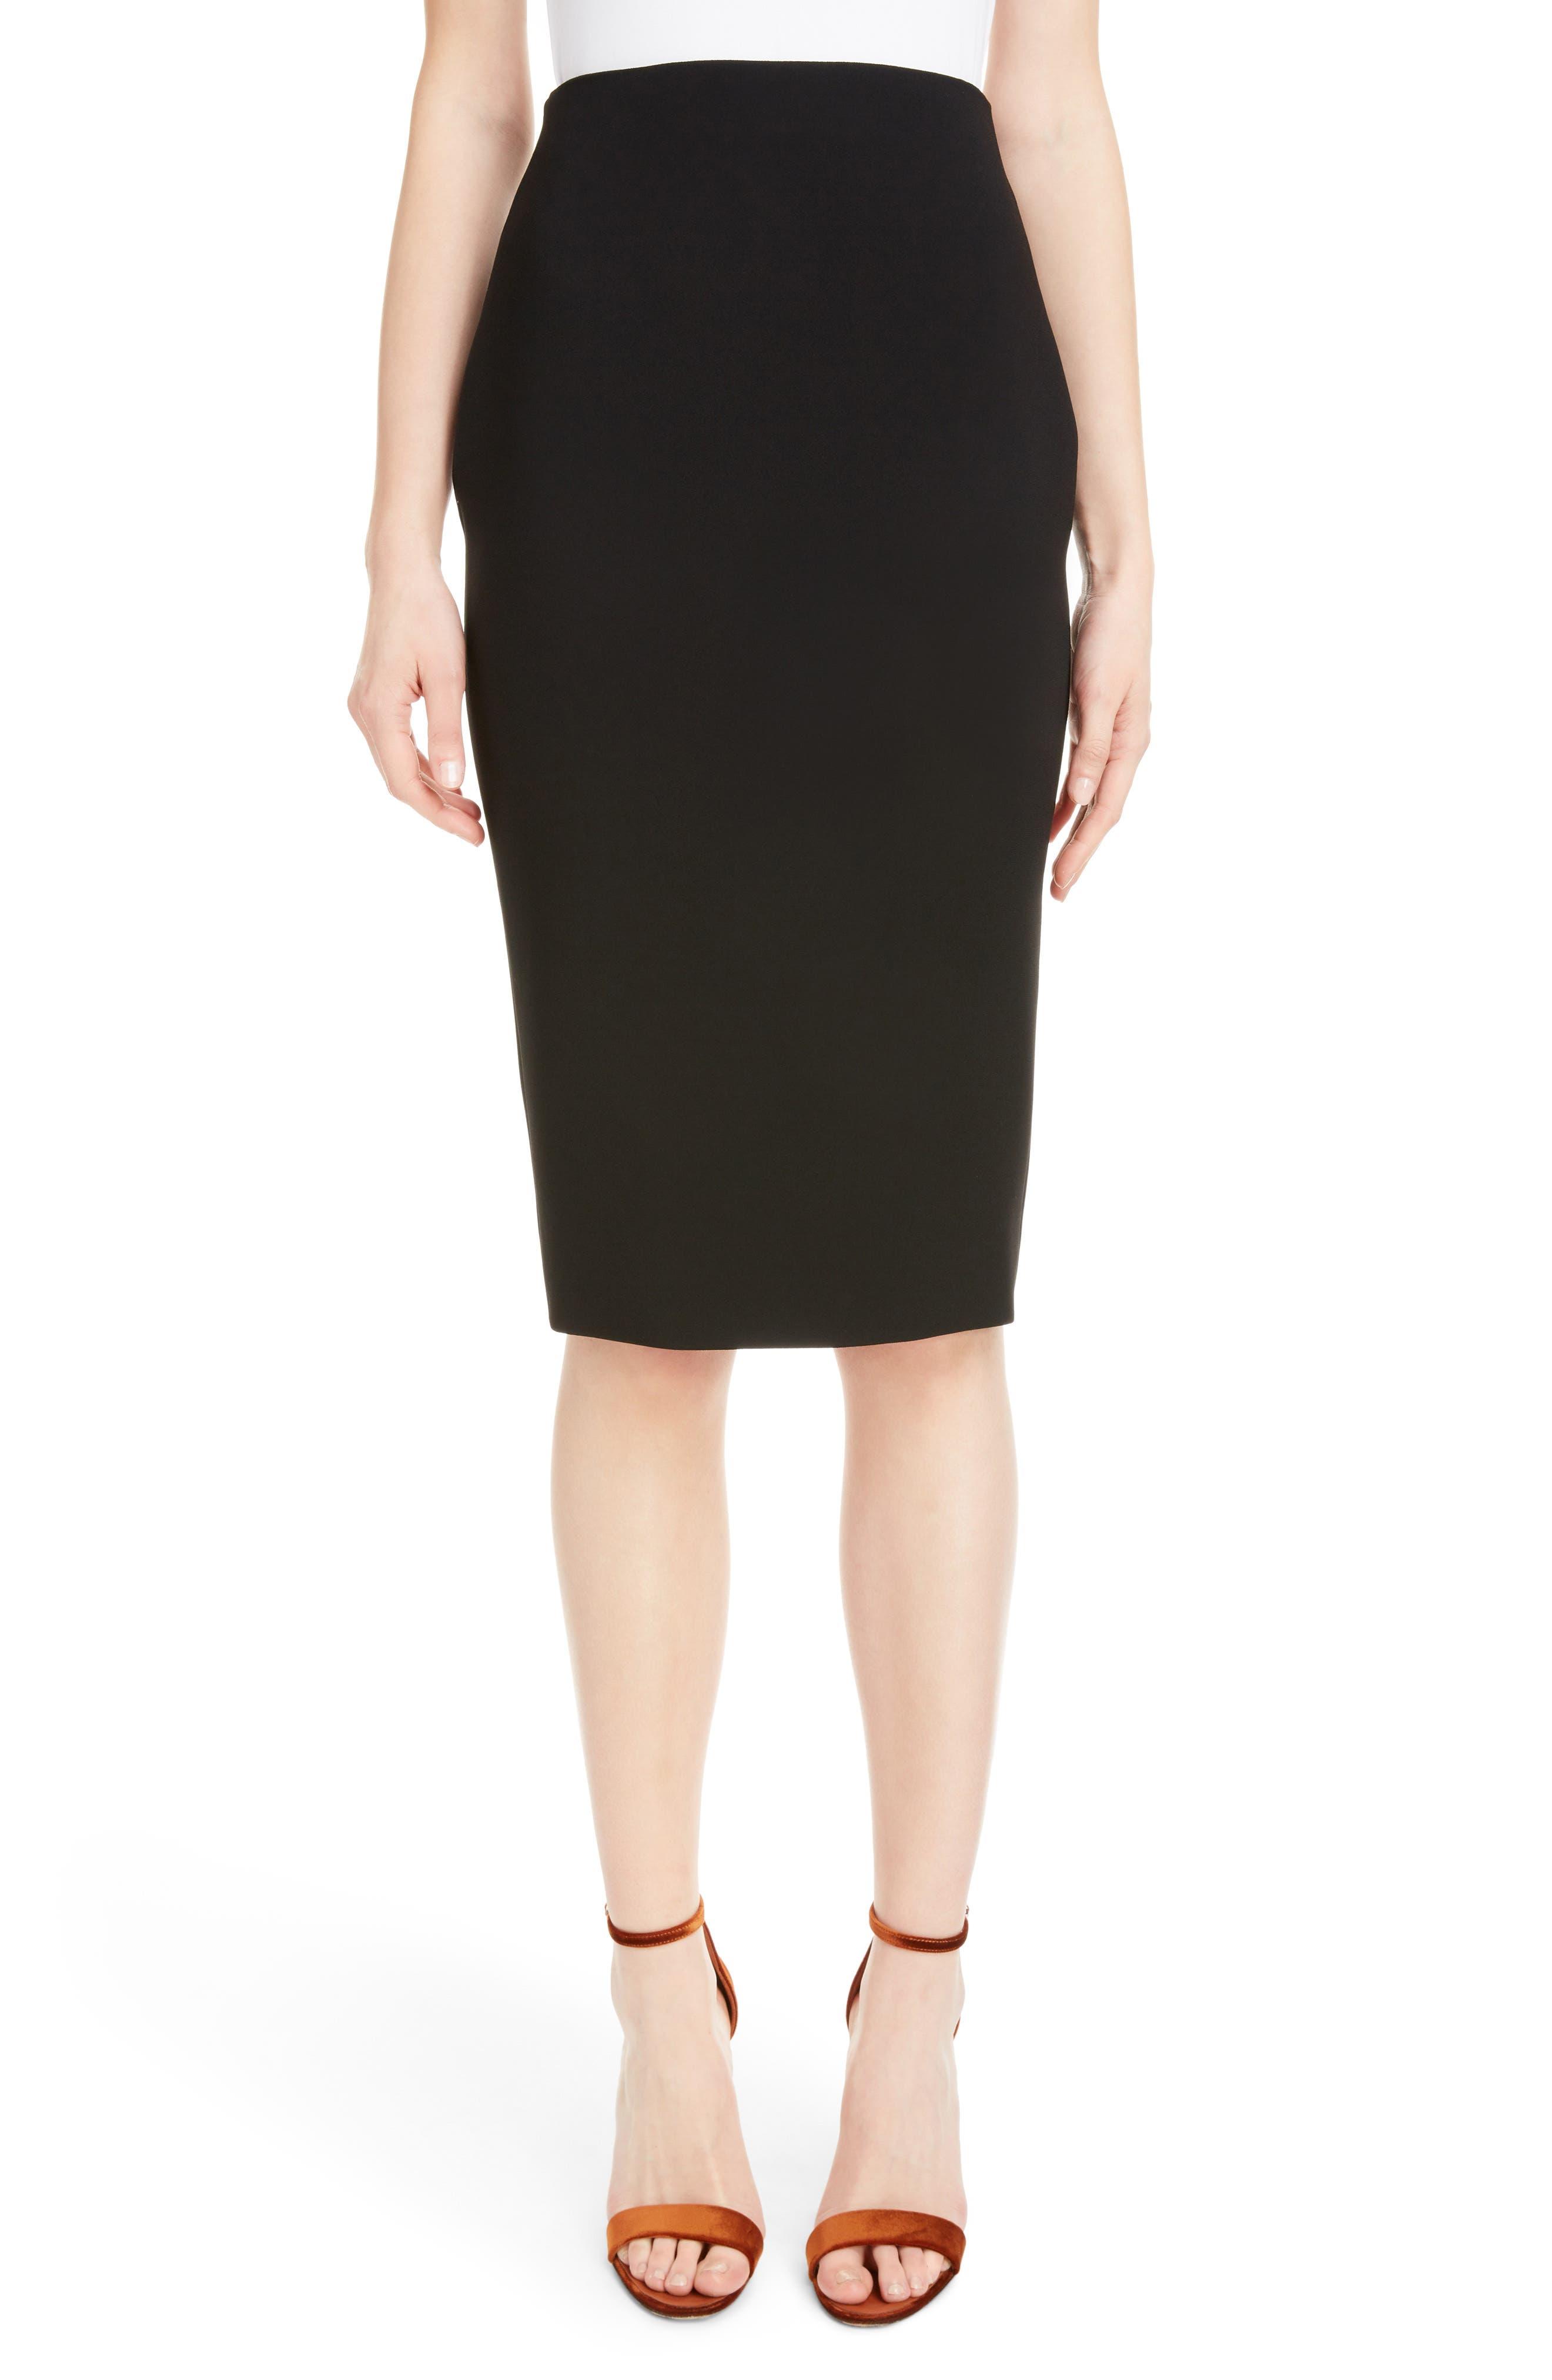 VICTORIA BECKHAM, Back Zip Pencil Skirt, Main thumbnail 1, color, BLACK